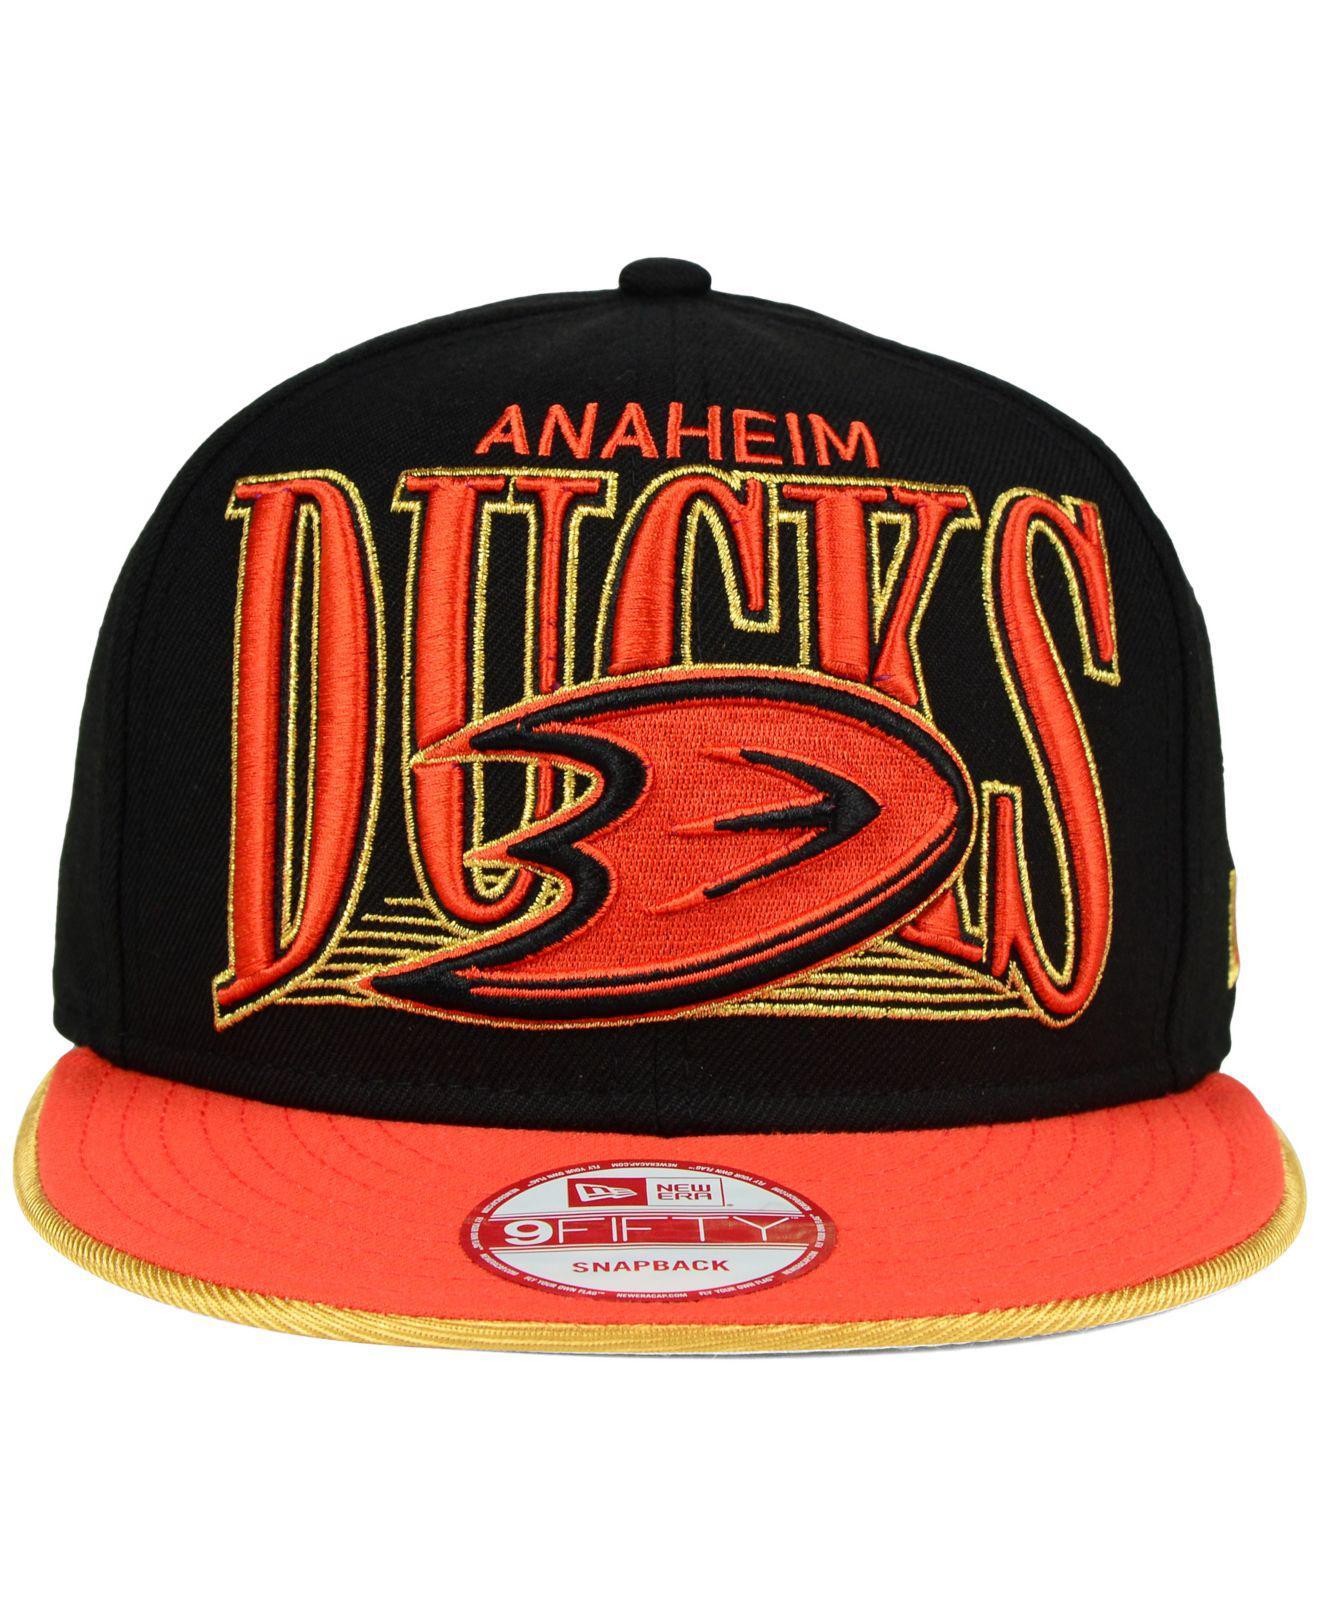 buy popular eb475 80d87 Lyst - KTZ Anaheim Ducks Ice Block 9fifty Snapback Cap in Black for Men